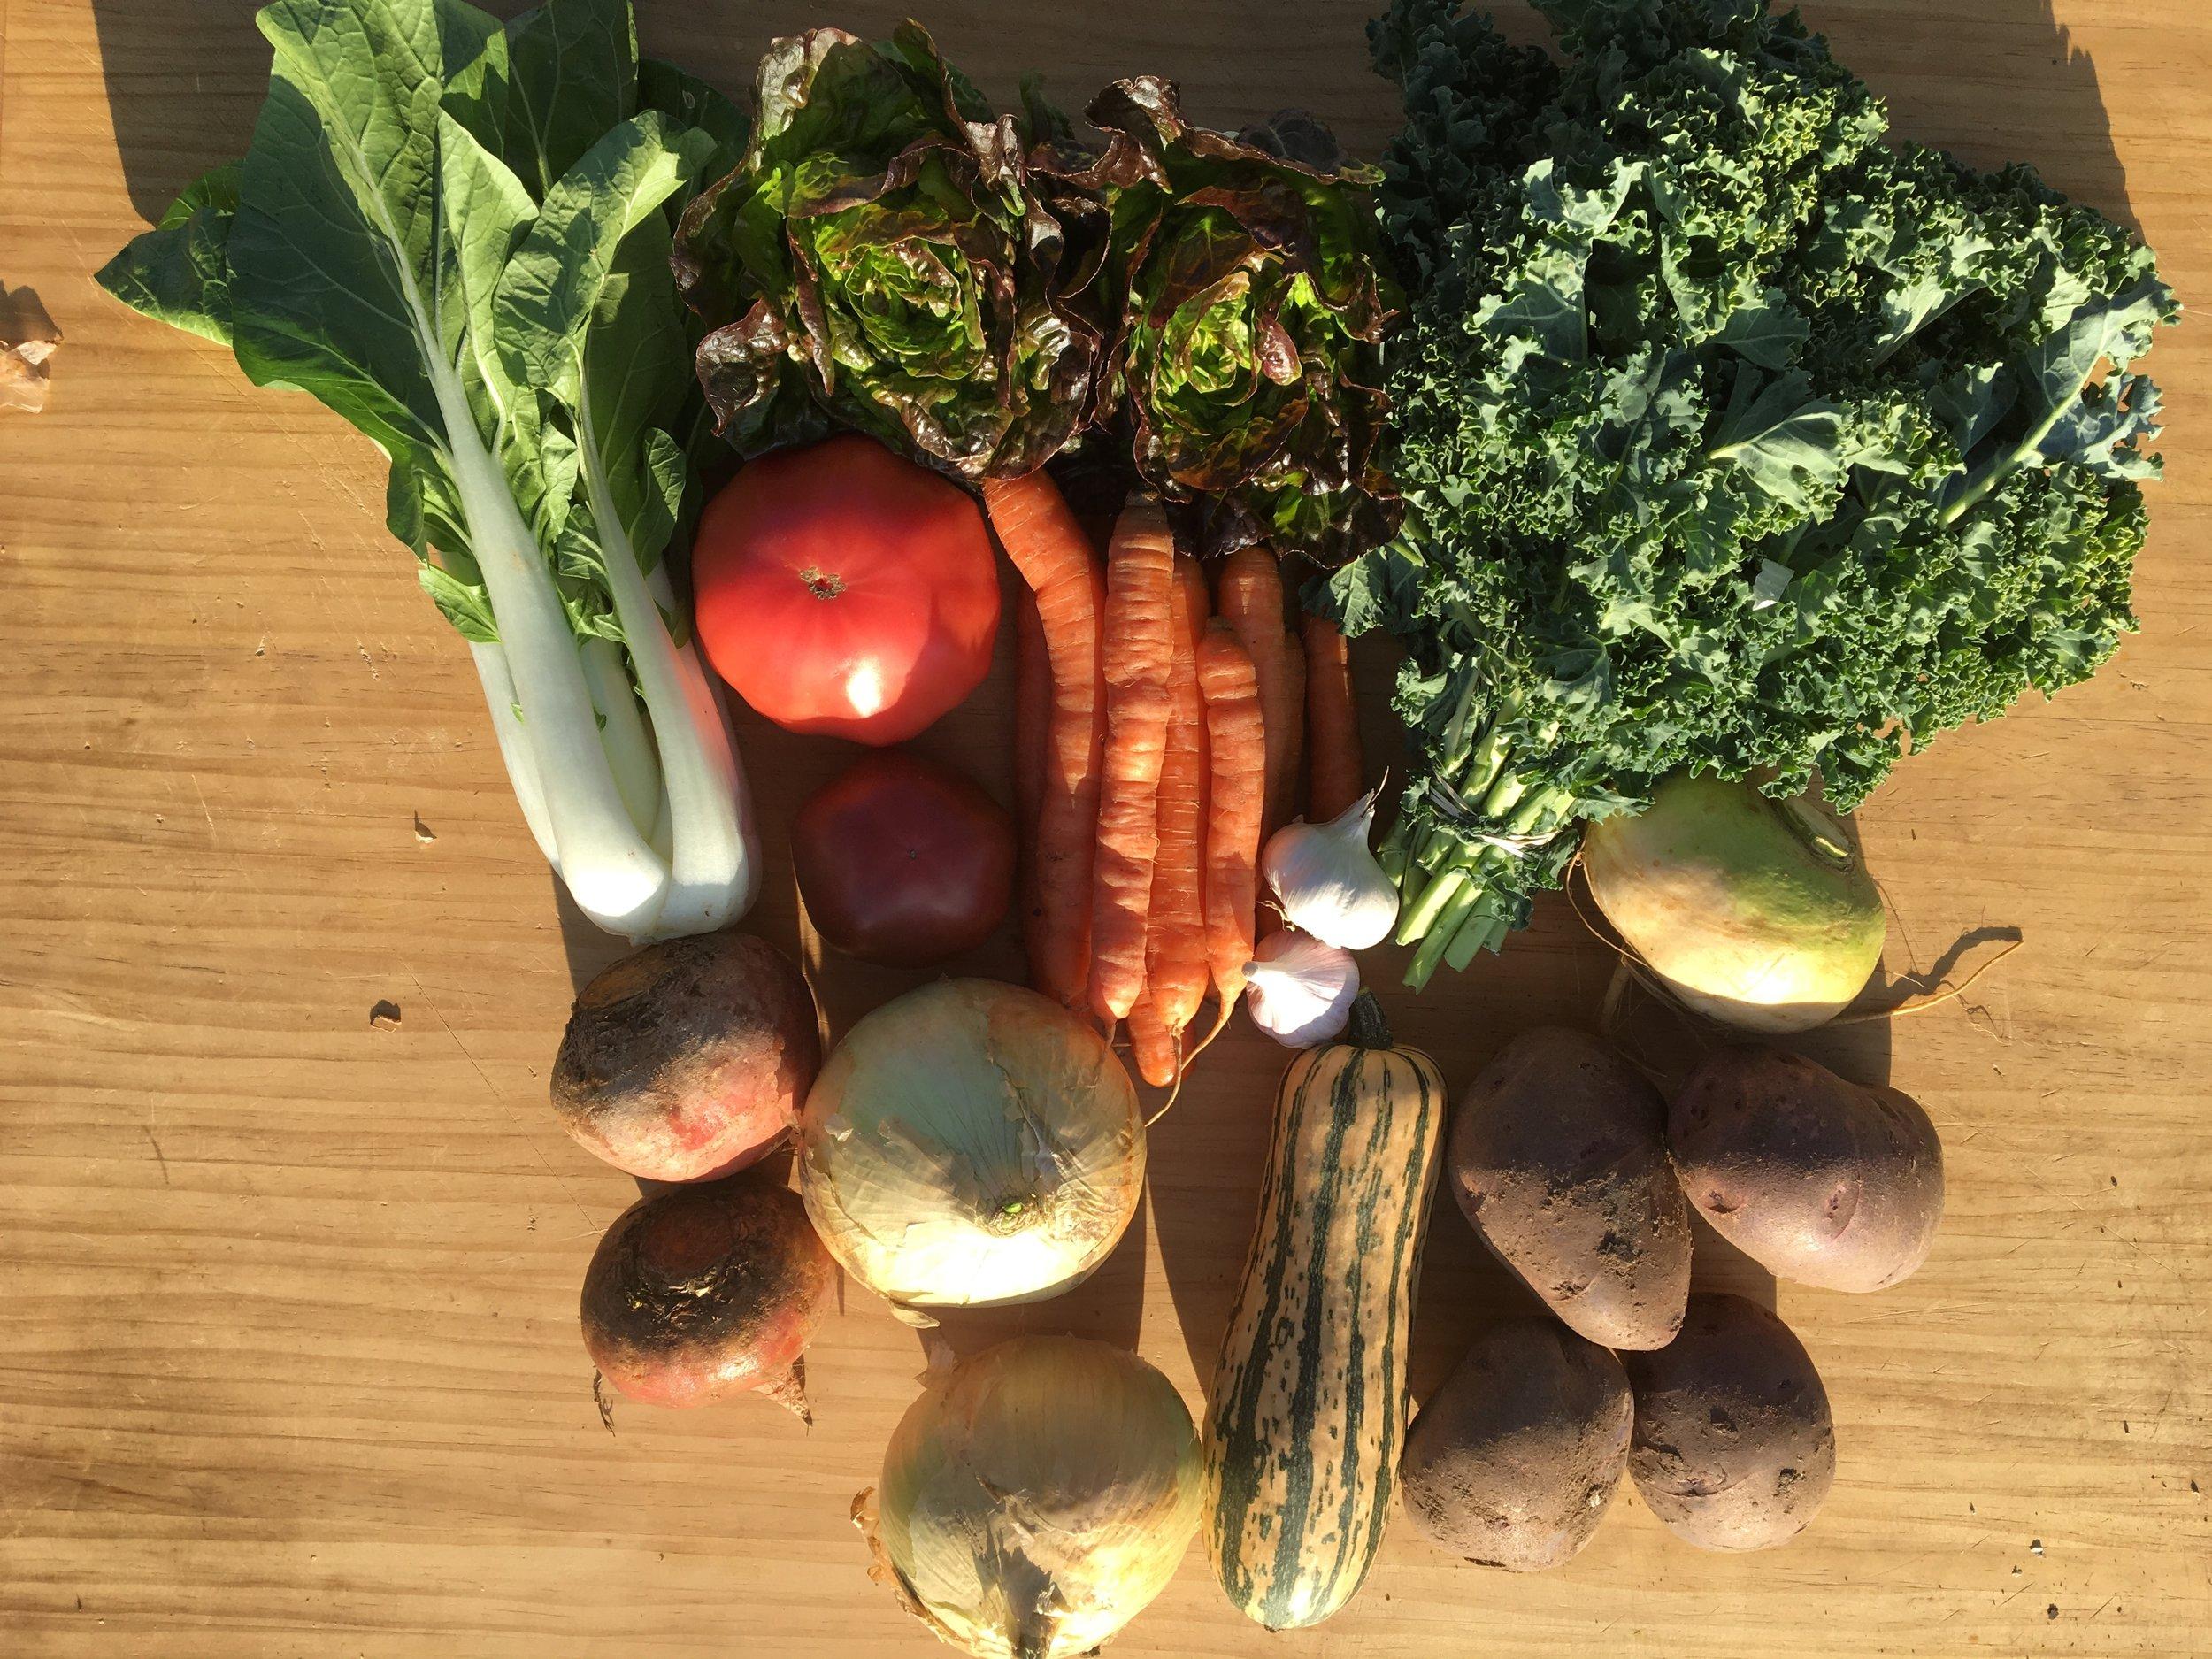 Summer CSA Week #18:Bok Choy, Little Gem Lettuces, Kale, Heirloom Tomatoes, Carrots, Garlic, Golden Turnip, Golden Beets, Walla Walla Onions, Delicata Squash and Purple Viking Potatoes!